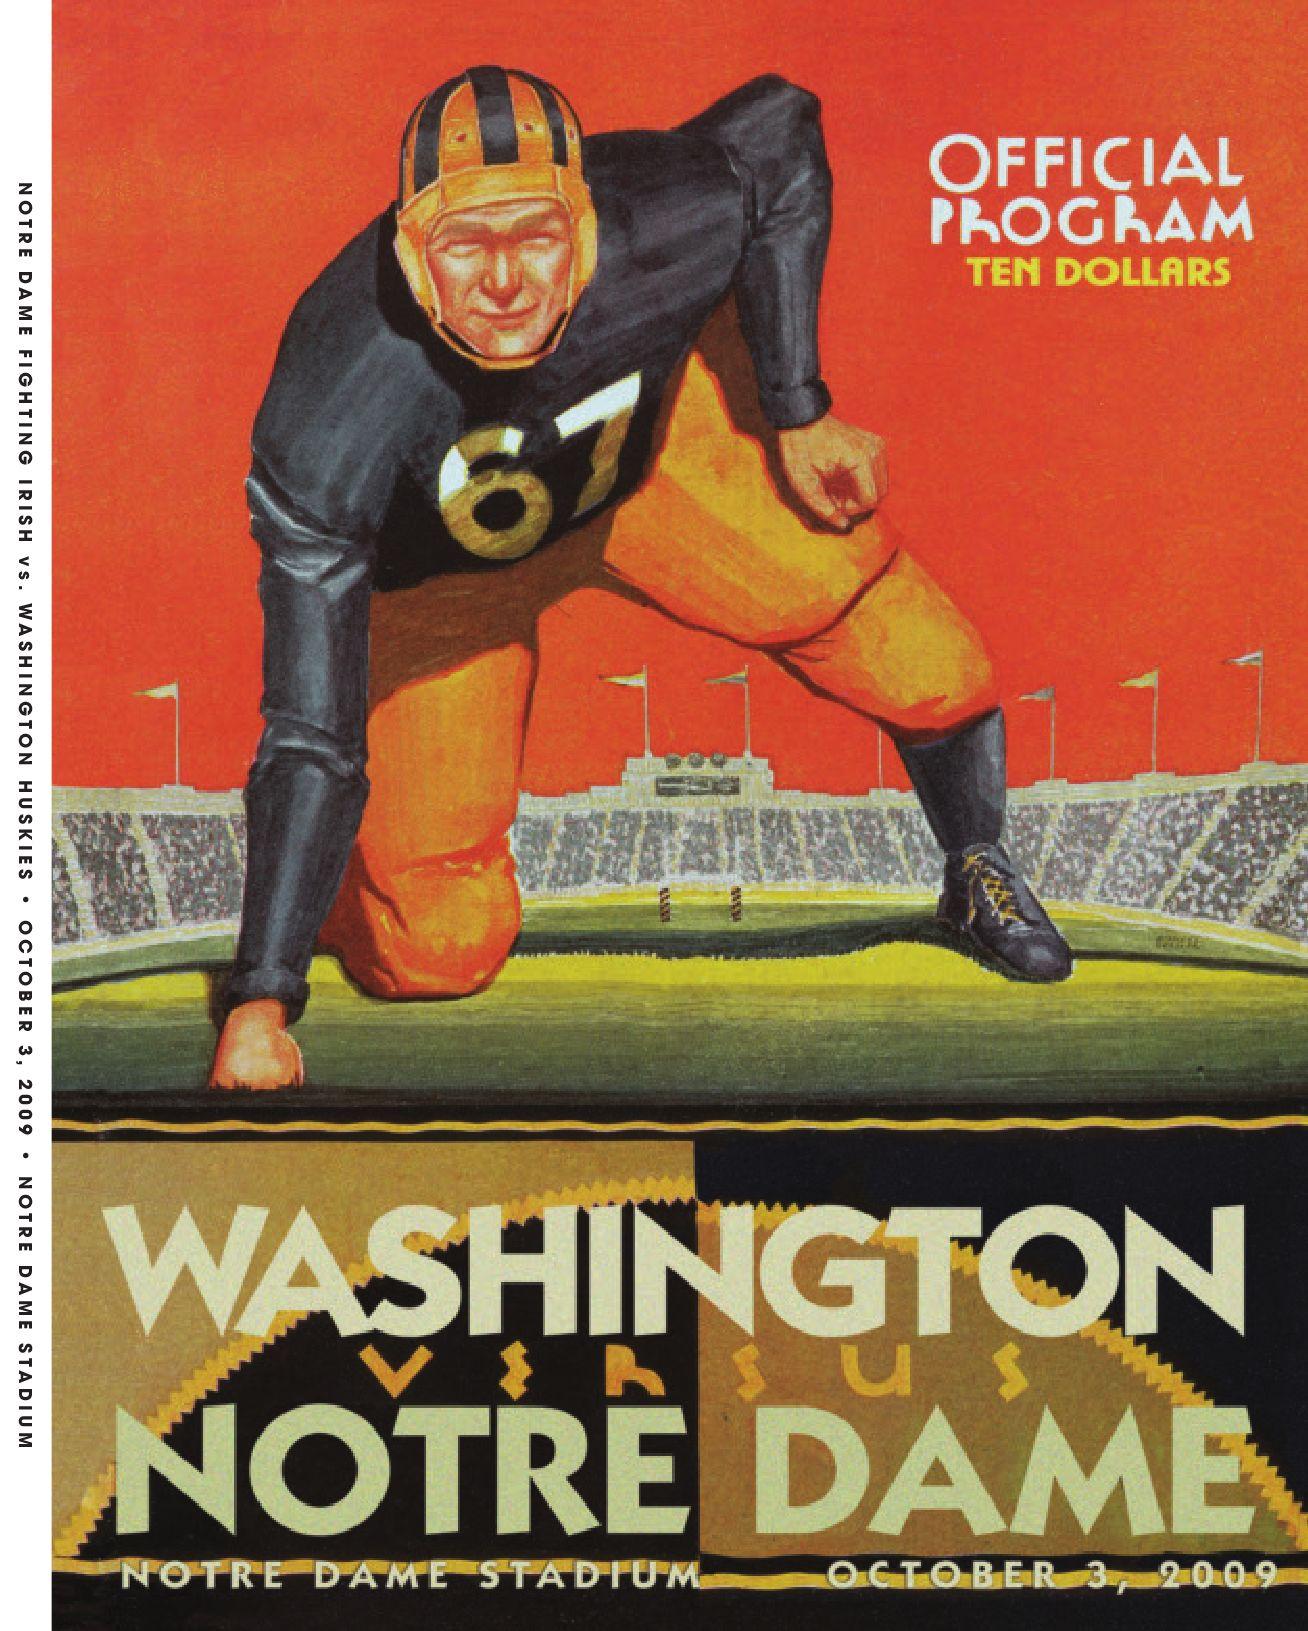 Nike NFL Jerseys - 2009 Notre Dame Football Game Program - Washington State by Chris ...